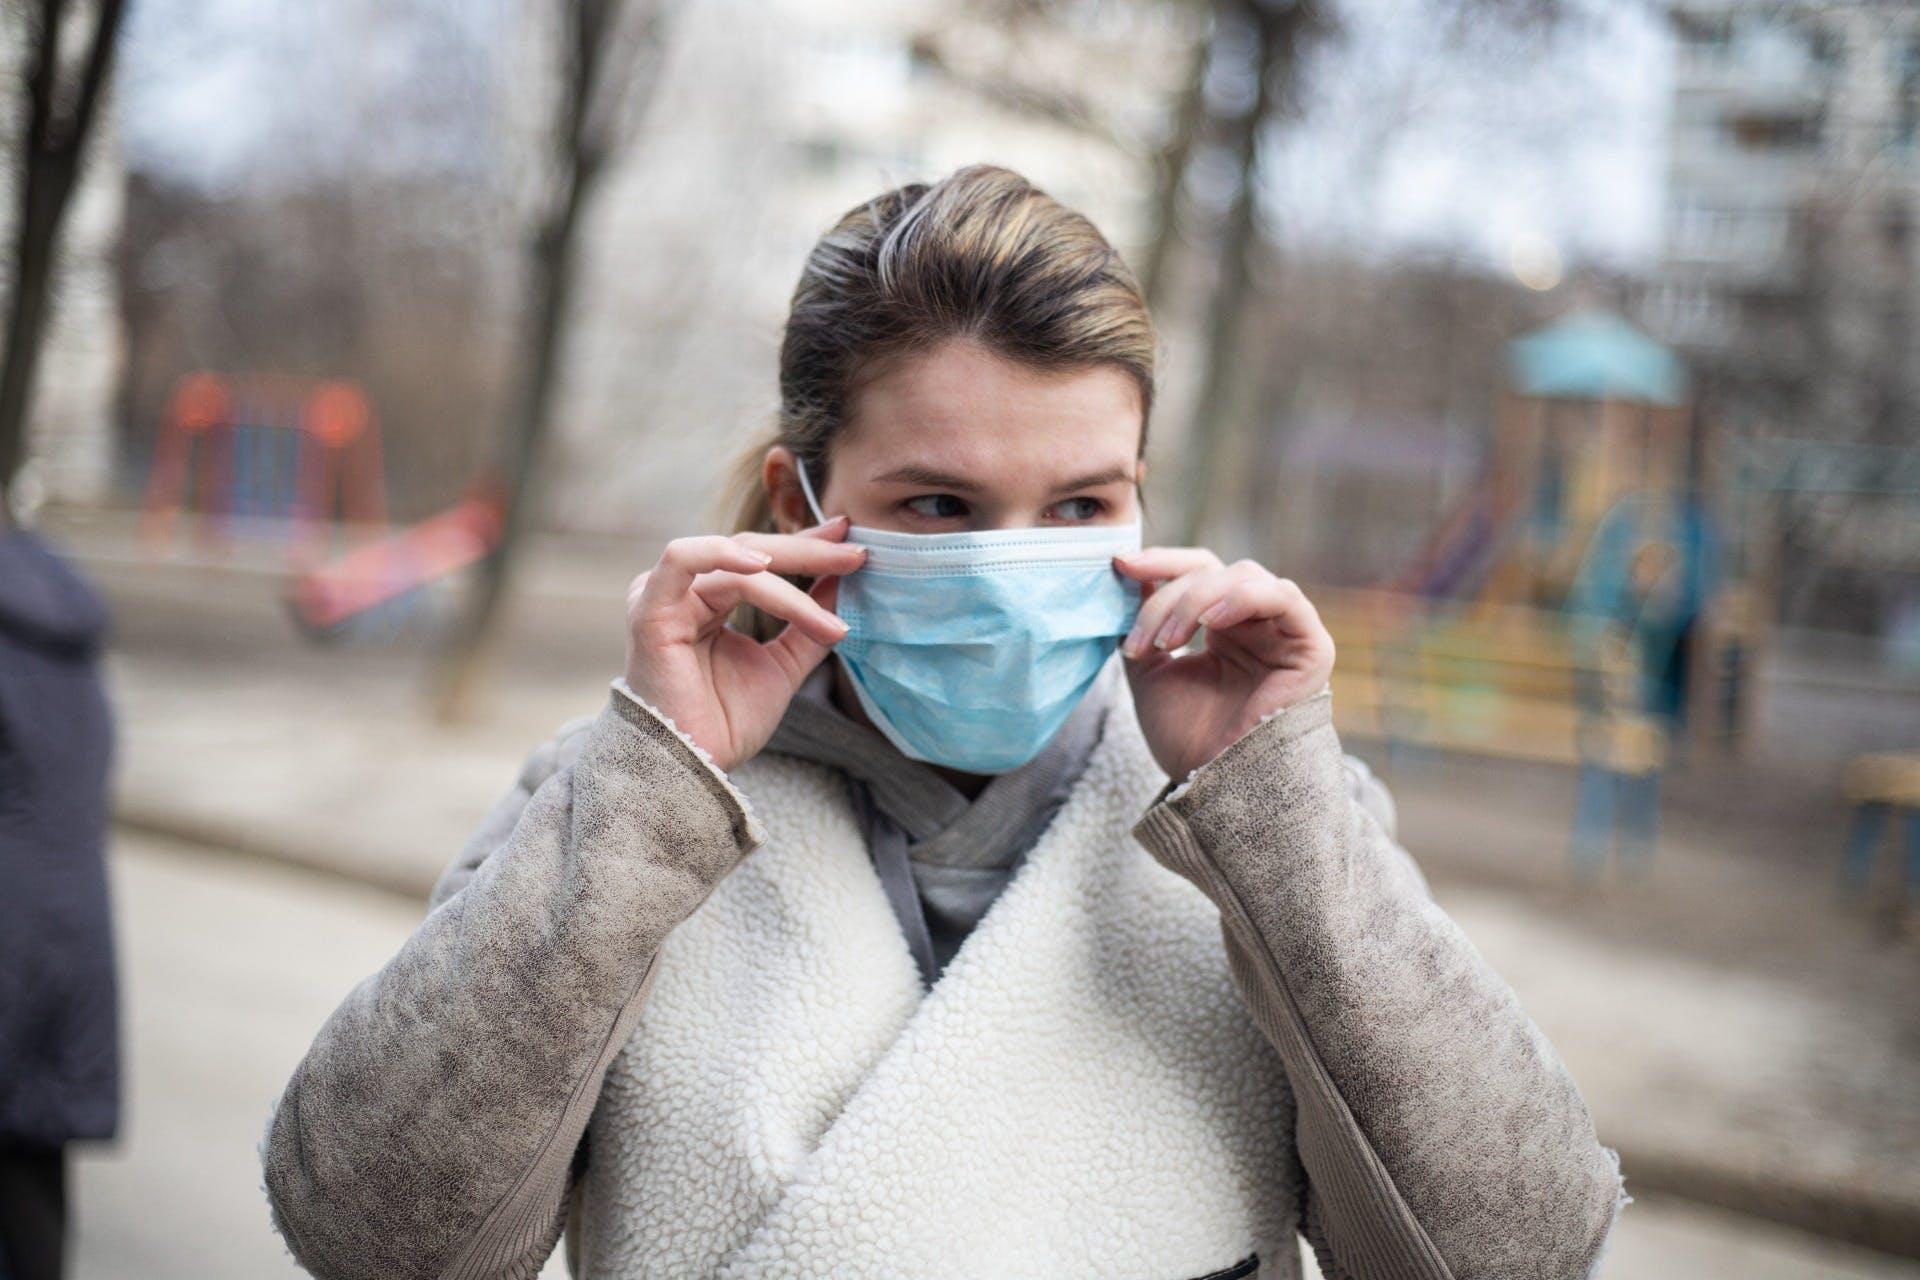 Woman fixing face mask